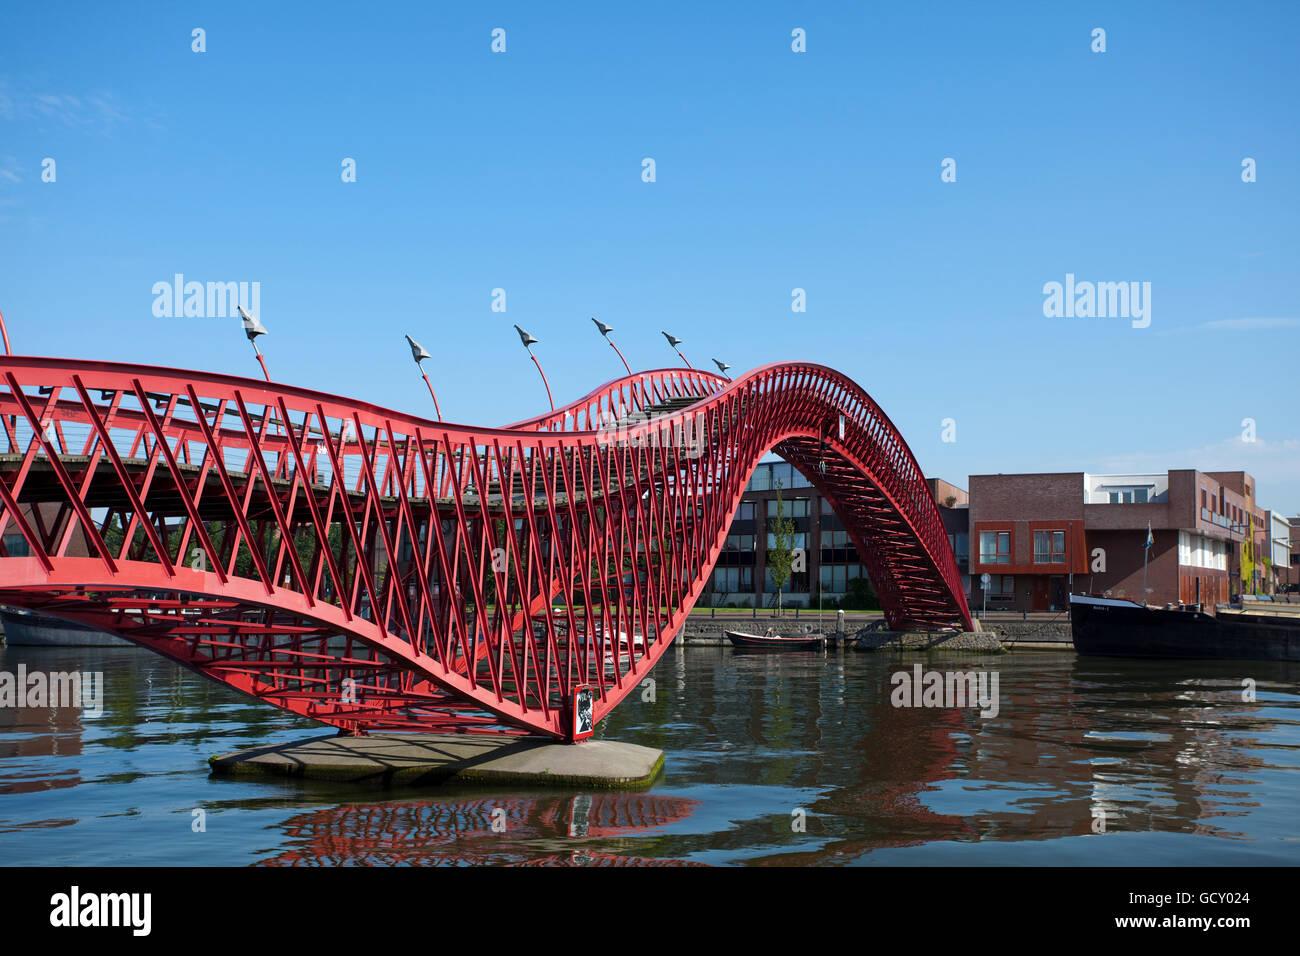 Pedestrian bridge connecting Borneo island and Sporenbrug island, designed by Adriaan Geuze, Amsterdam, Holland region Stock Photo